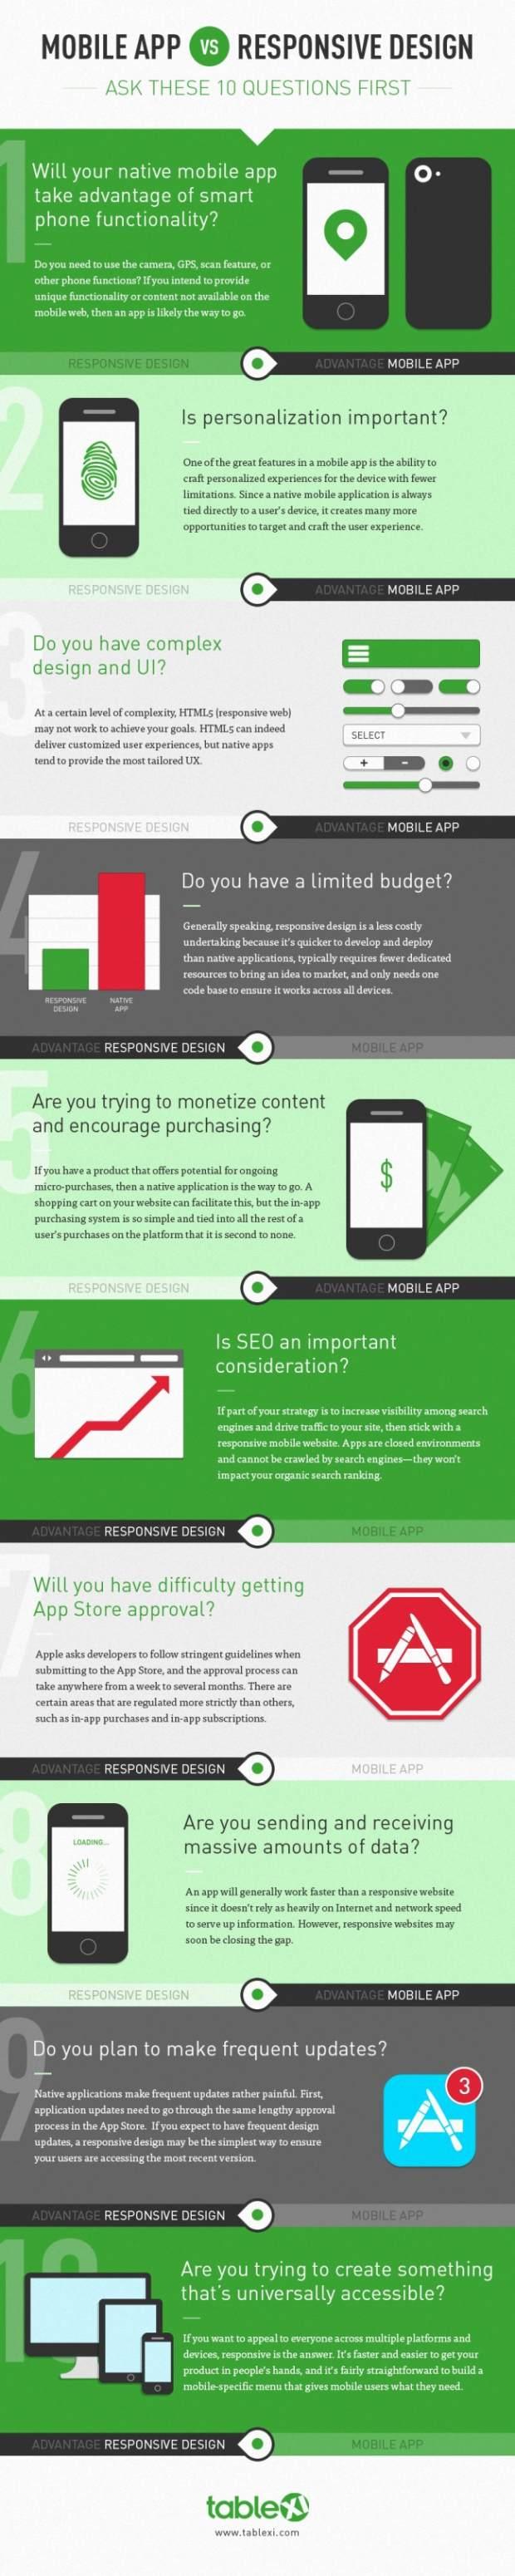 mobiele app versus responsive design